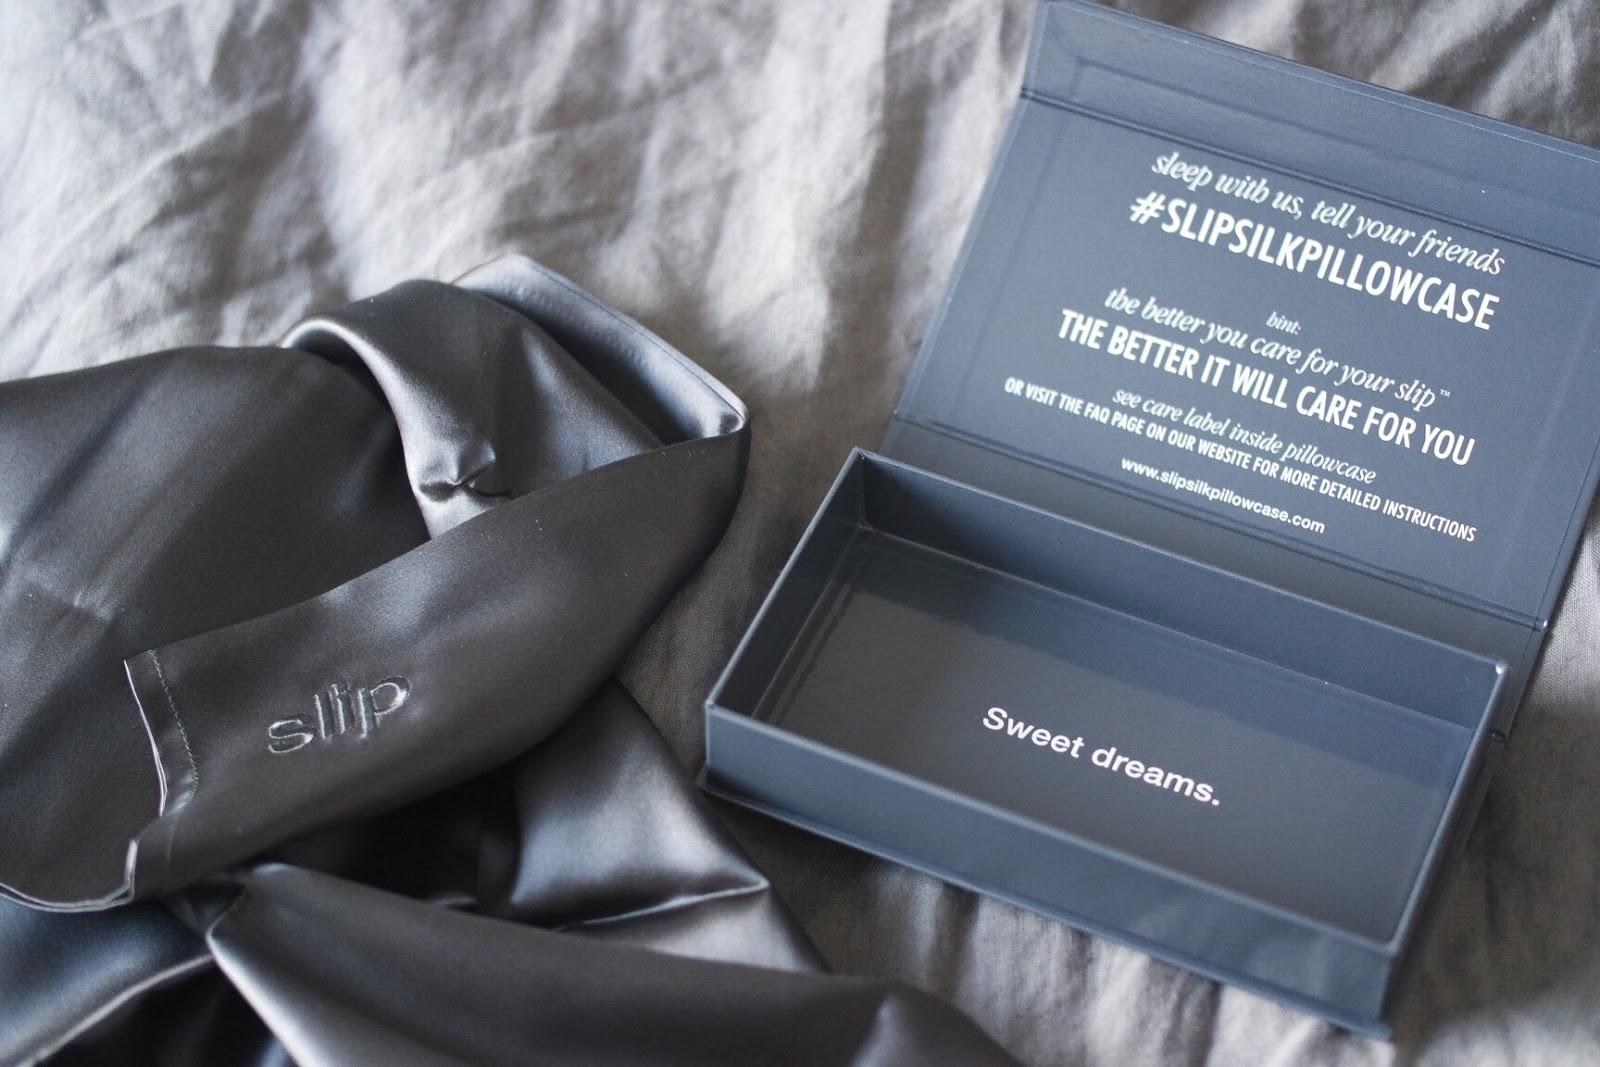 slip silk pillowcases kind of worth the hype